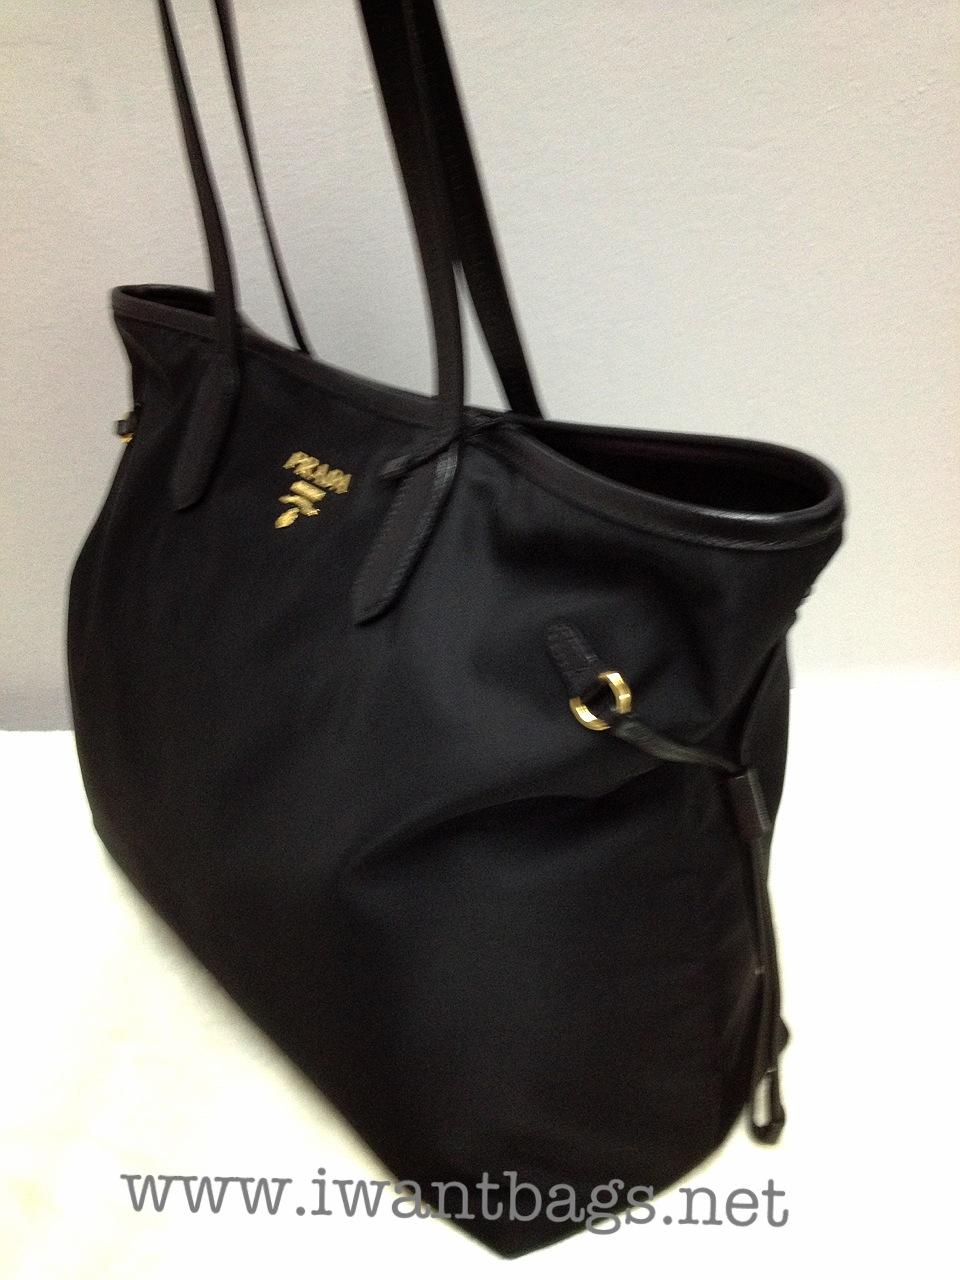 40c36263e6b2 ... saffiano shopping bag 66114 dc76c where to buy prada tessuto shopping  tote nero 27e33 cd3b3 ...